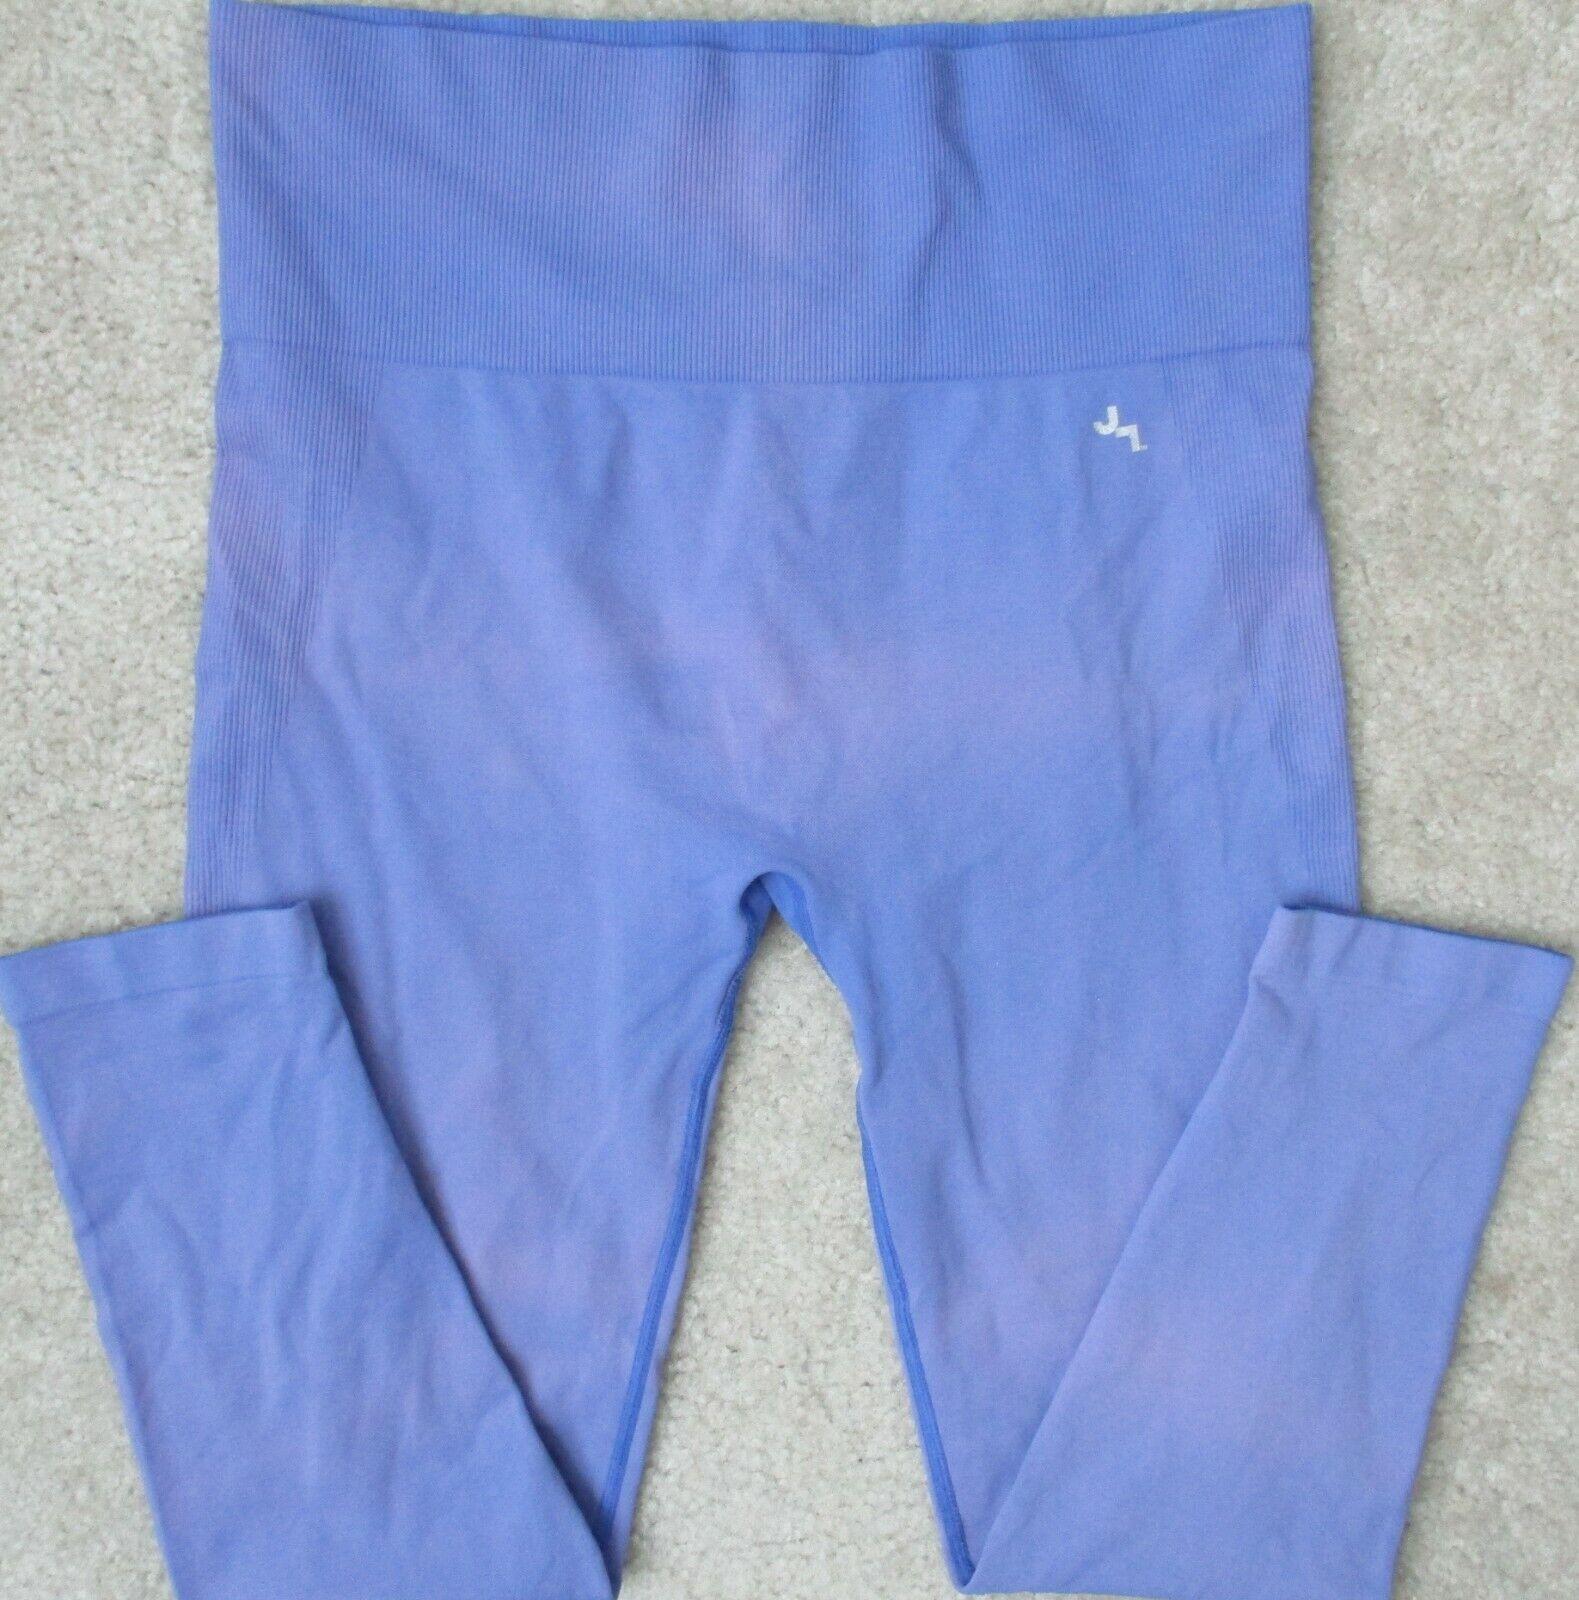 Joy Lab Womens L Tie Dye Stretch 97% Nylon Fitness Yoga Gym 3/4 Capris Leggings